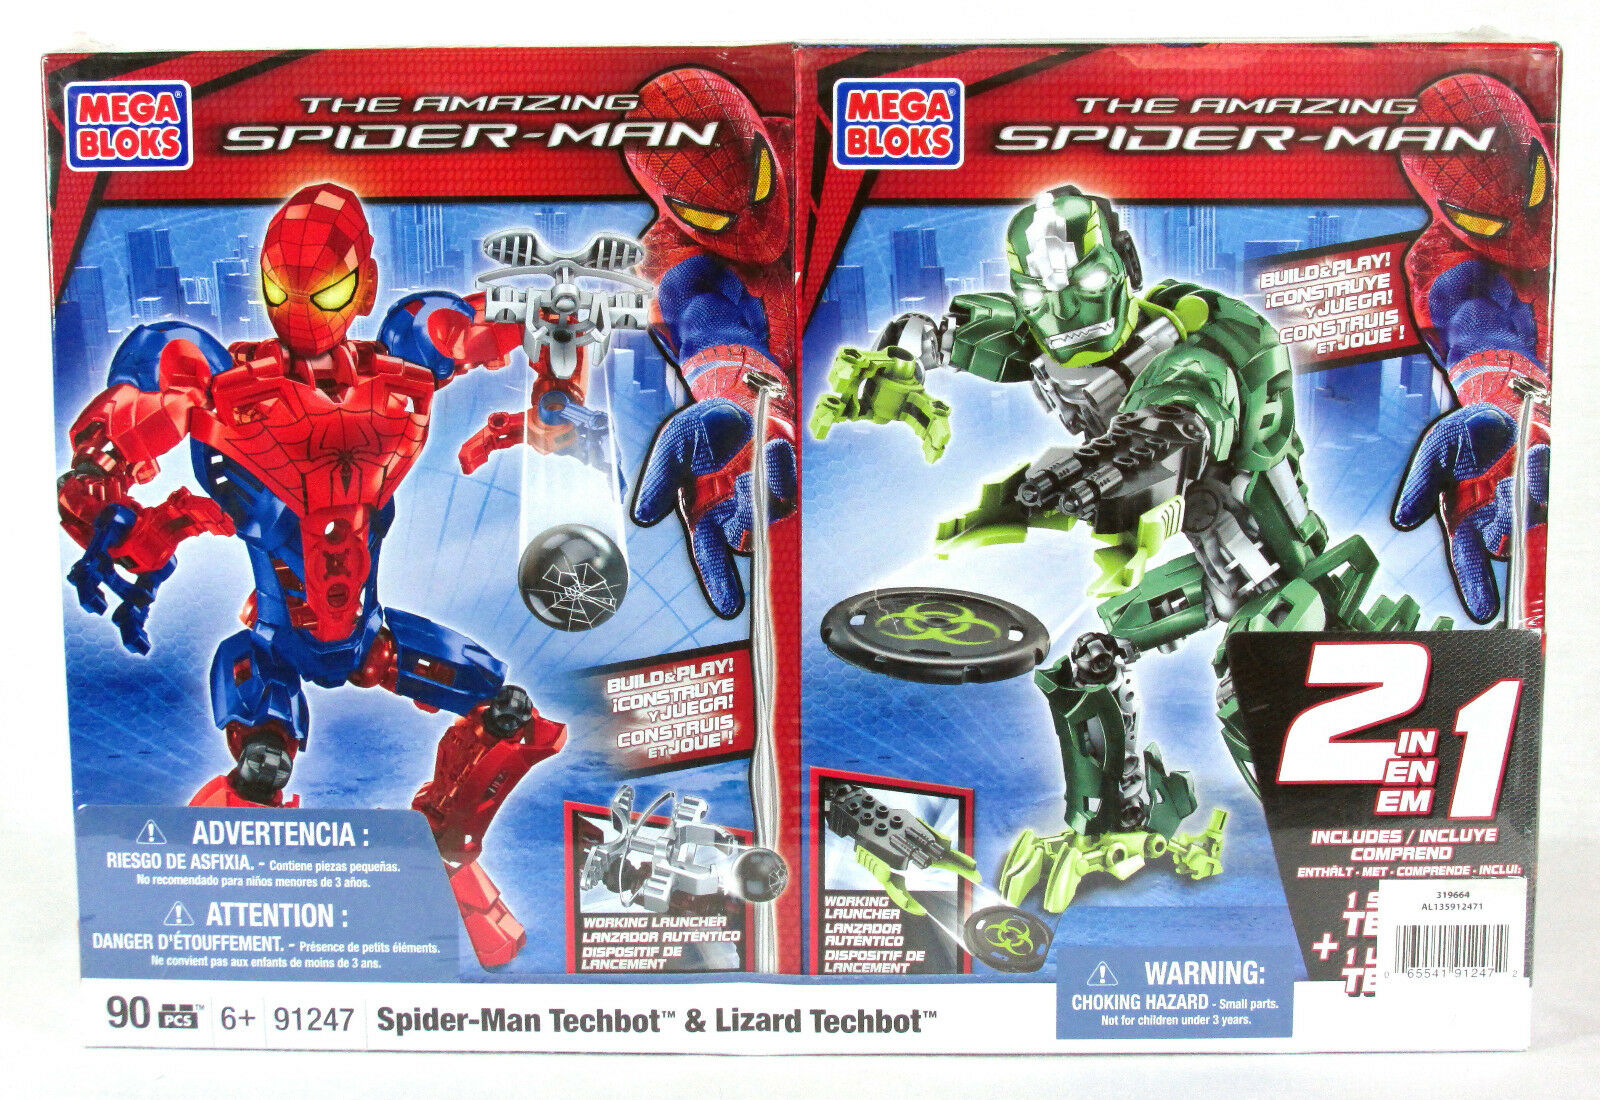 Mega - bloks   91247 amazing spider - man - echse techbot hat 90 pcs 6 + bnib versiegelt